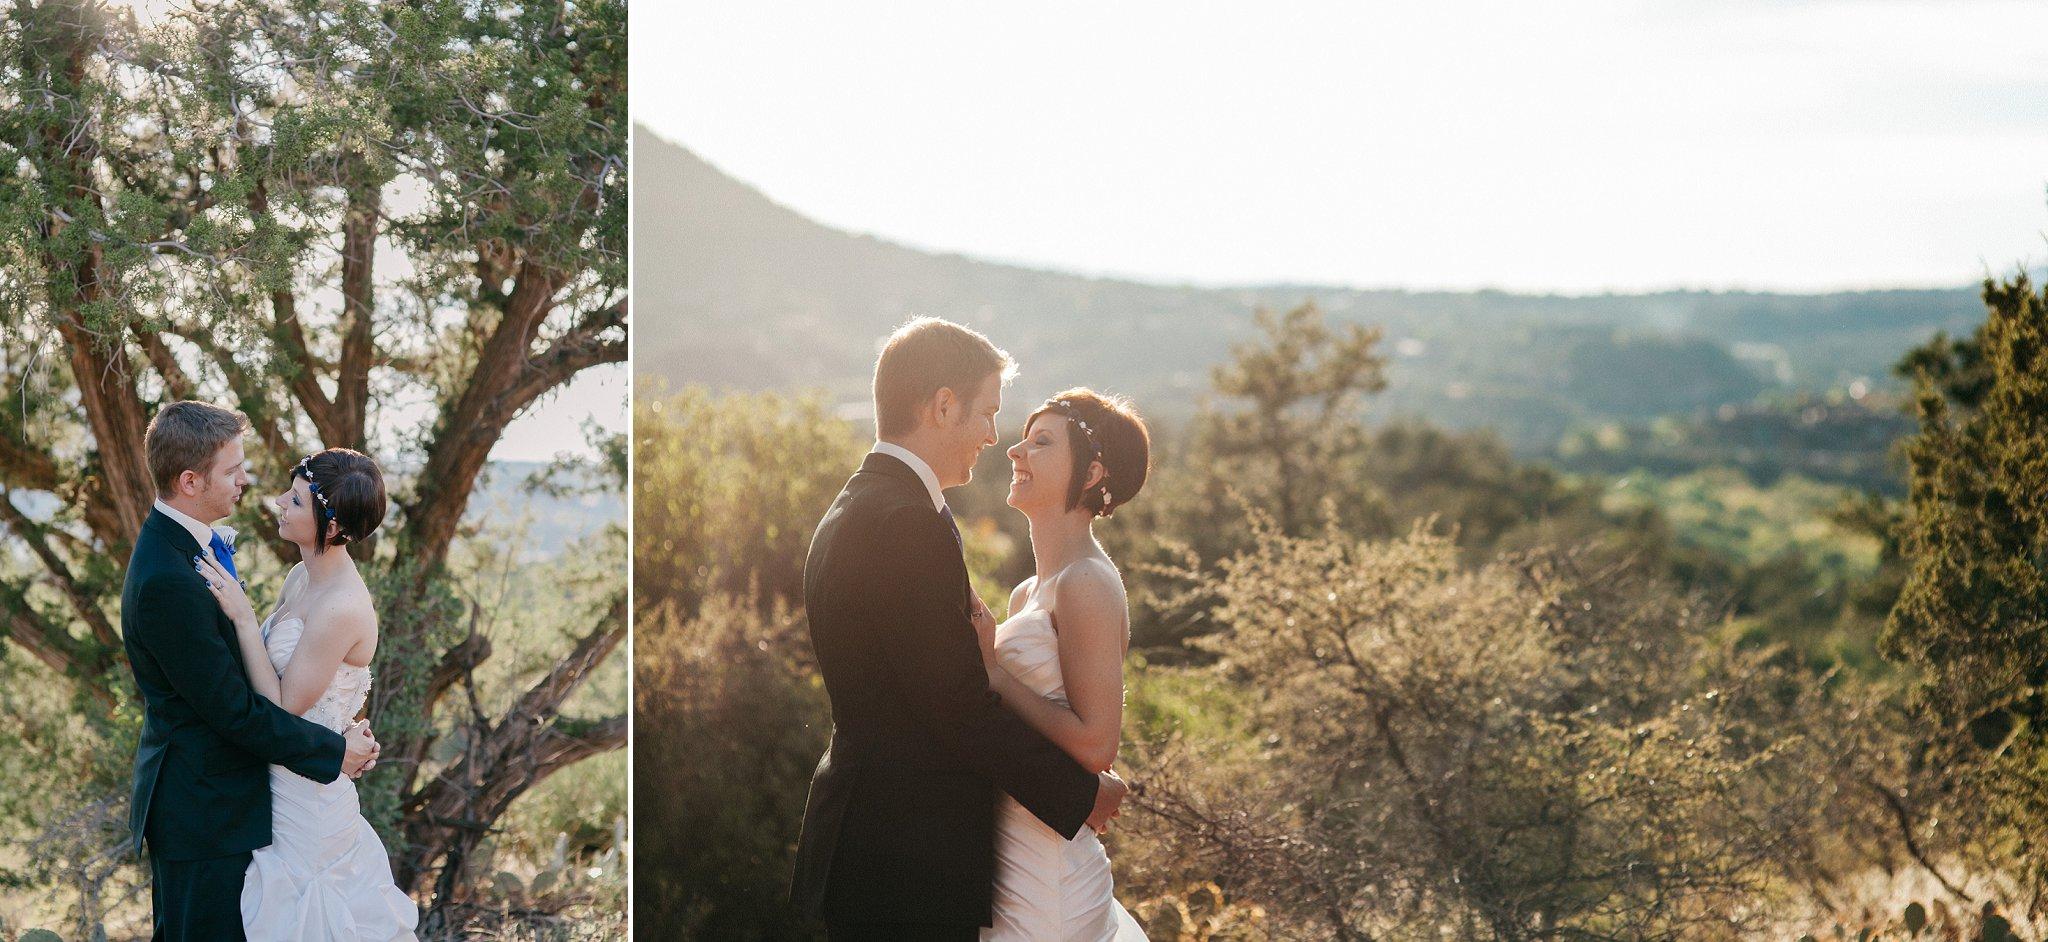 candid emotional Sedona elopement portraits